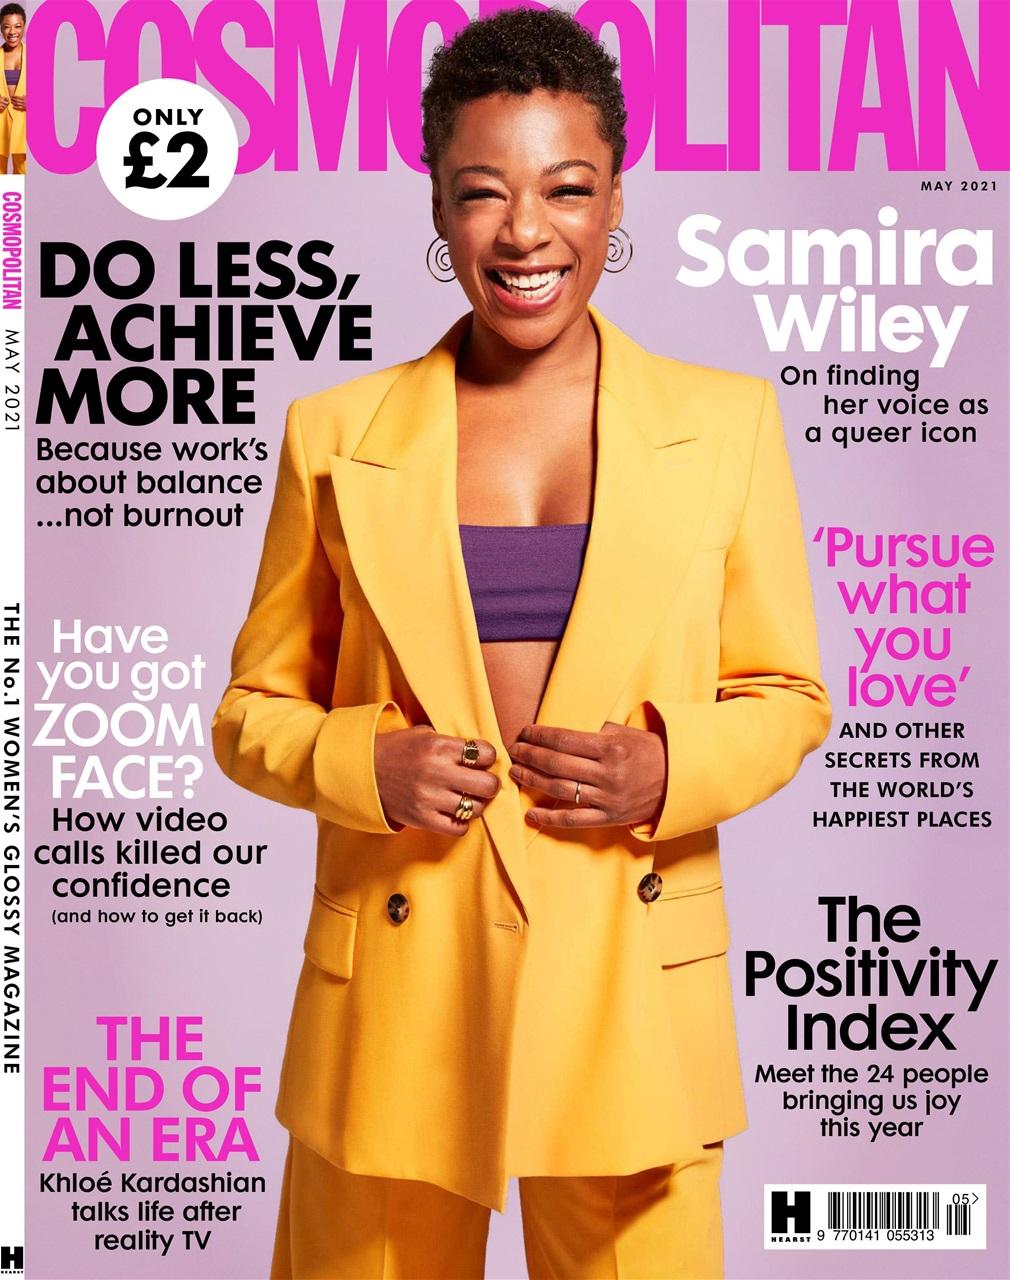 Cosmopolitan Magazine - May 2021 Subscriptions   Pocketmags